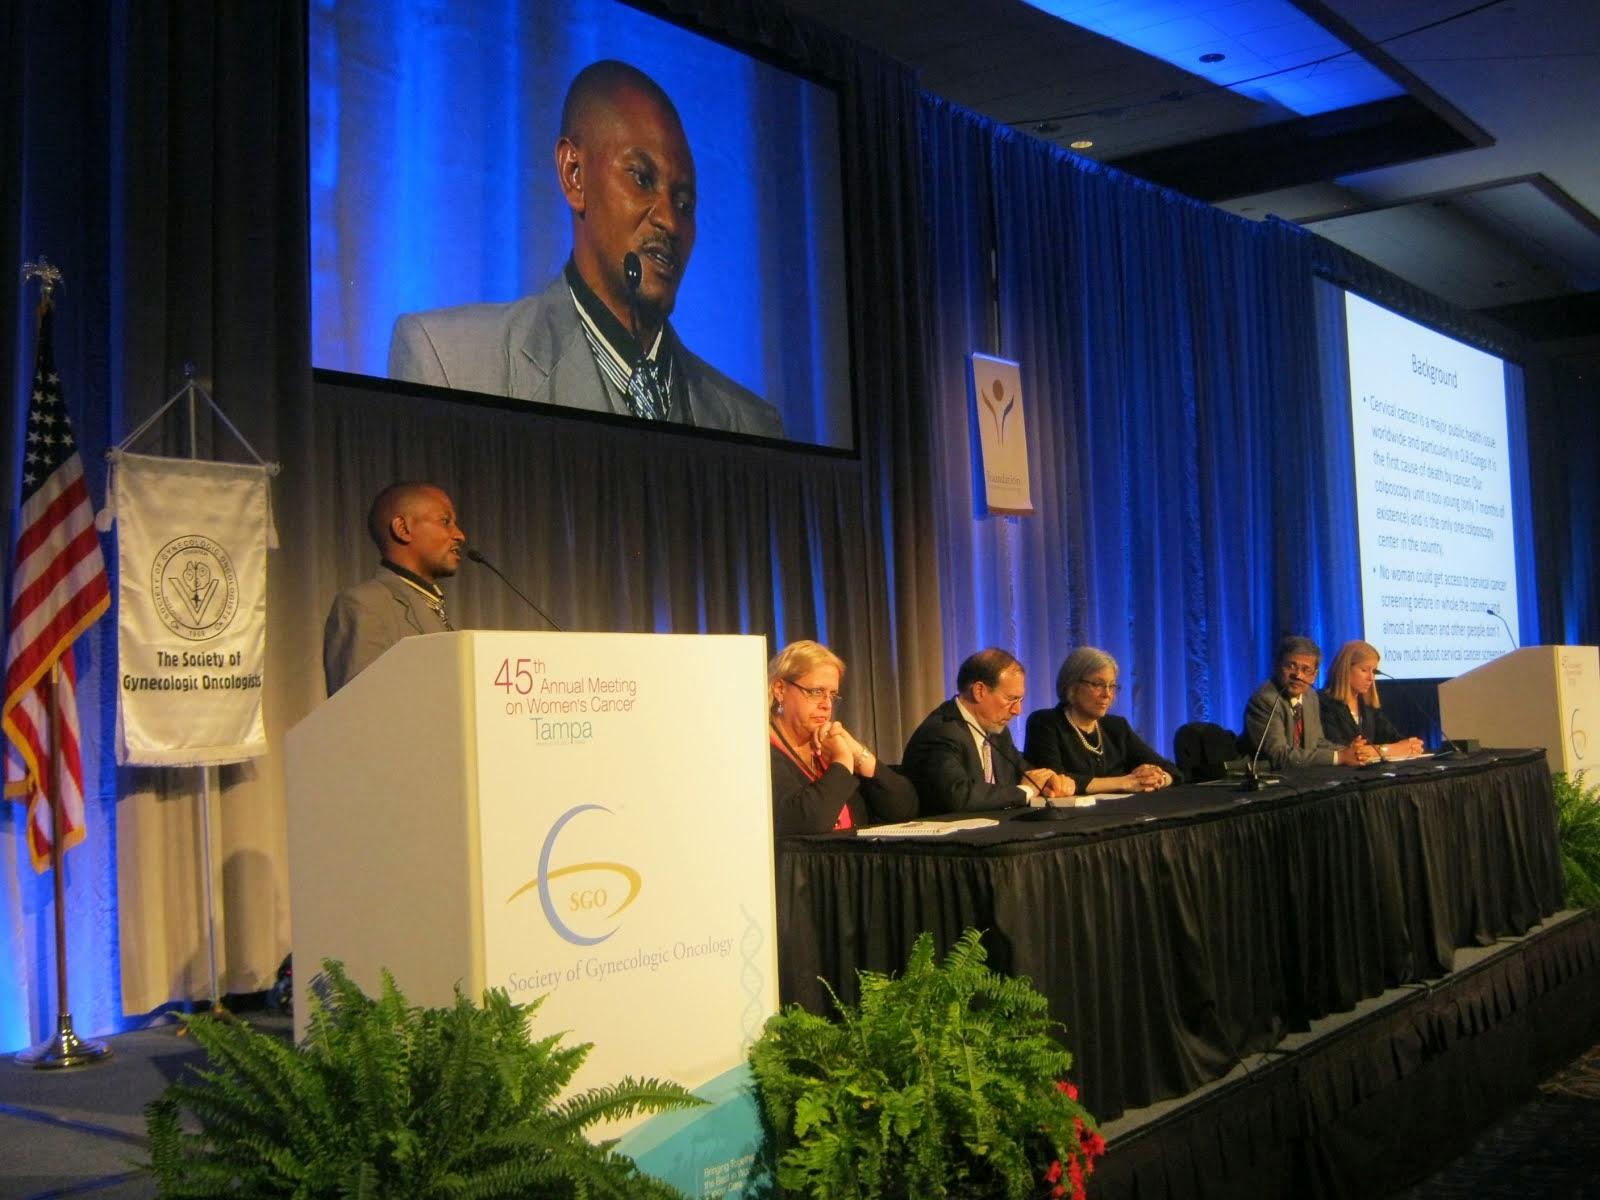 SGO Annual Meeting in Tampa/Florida